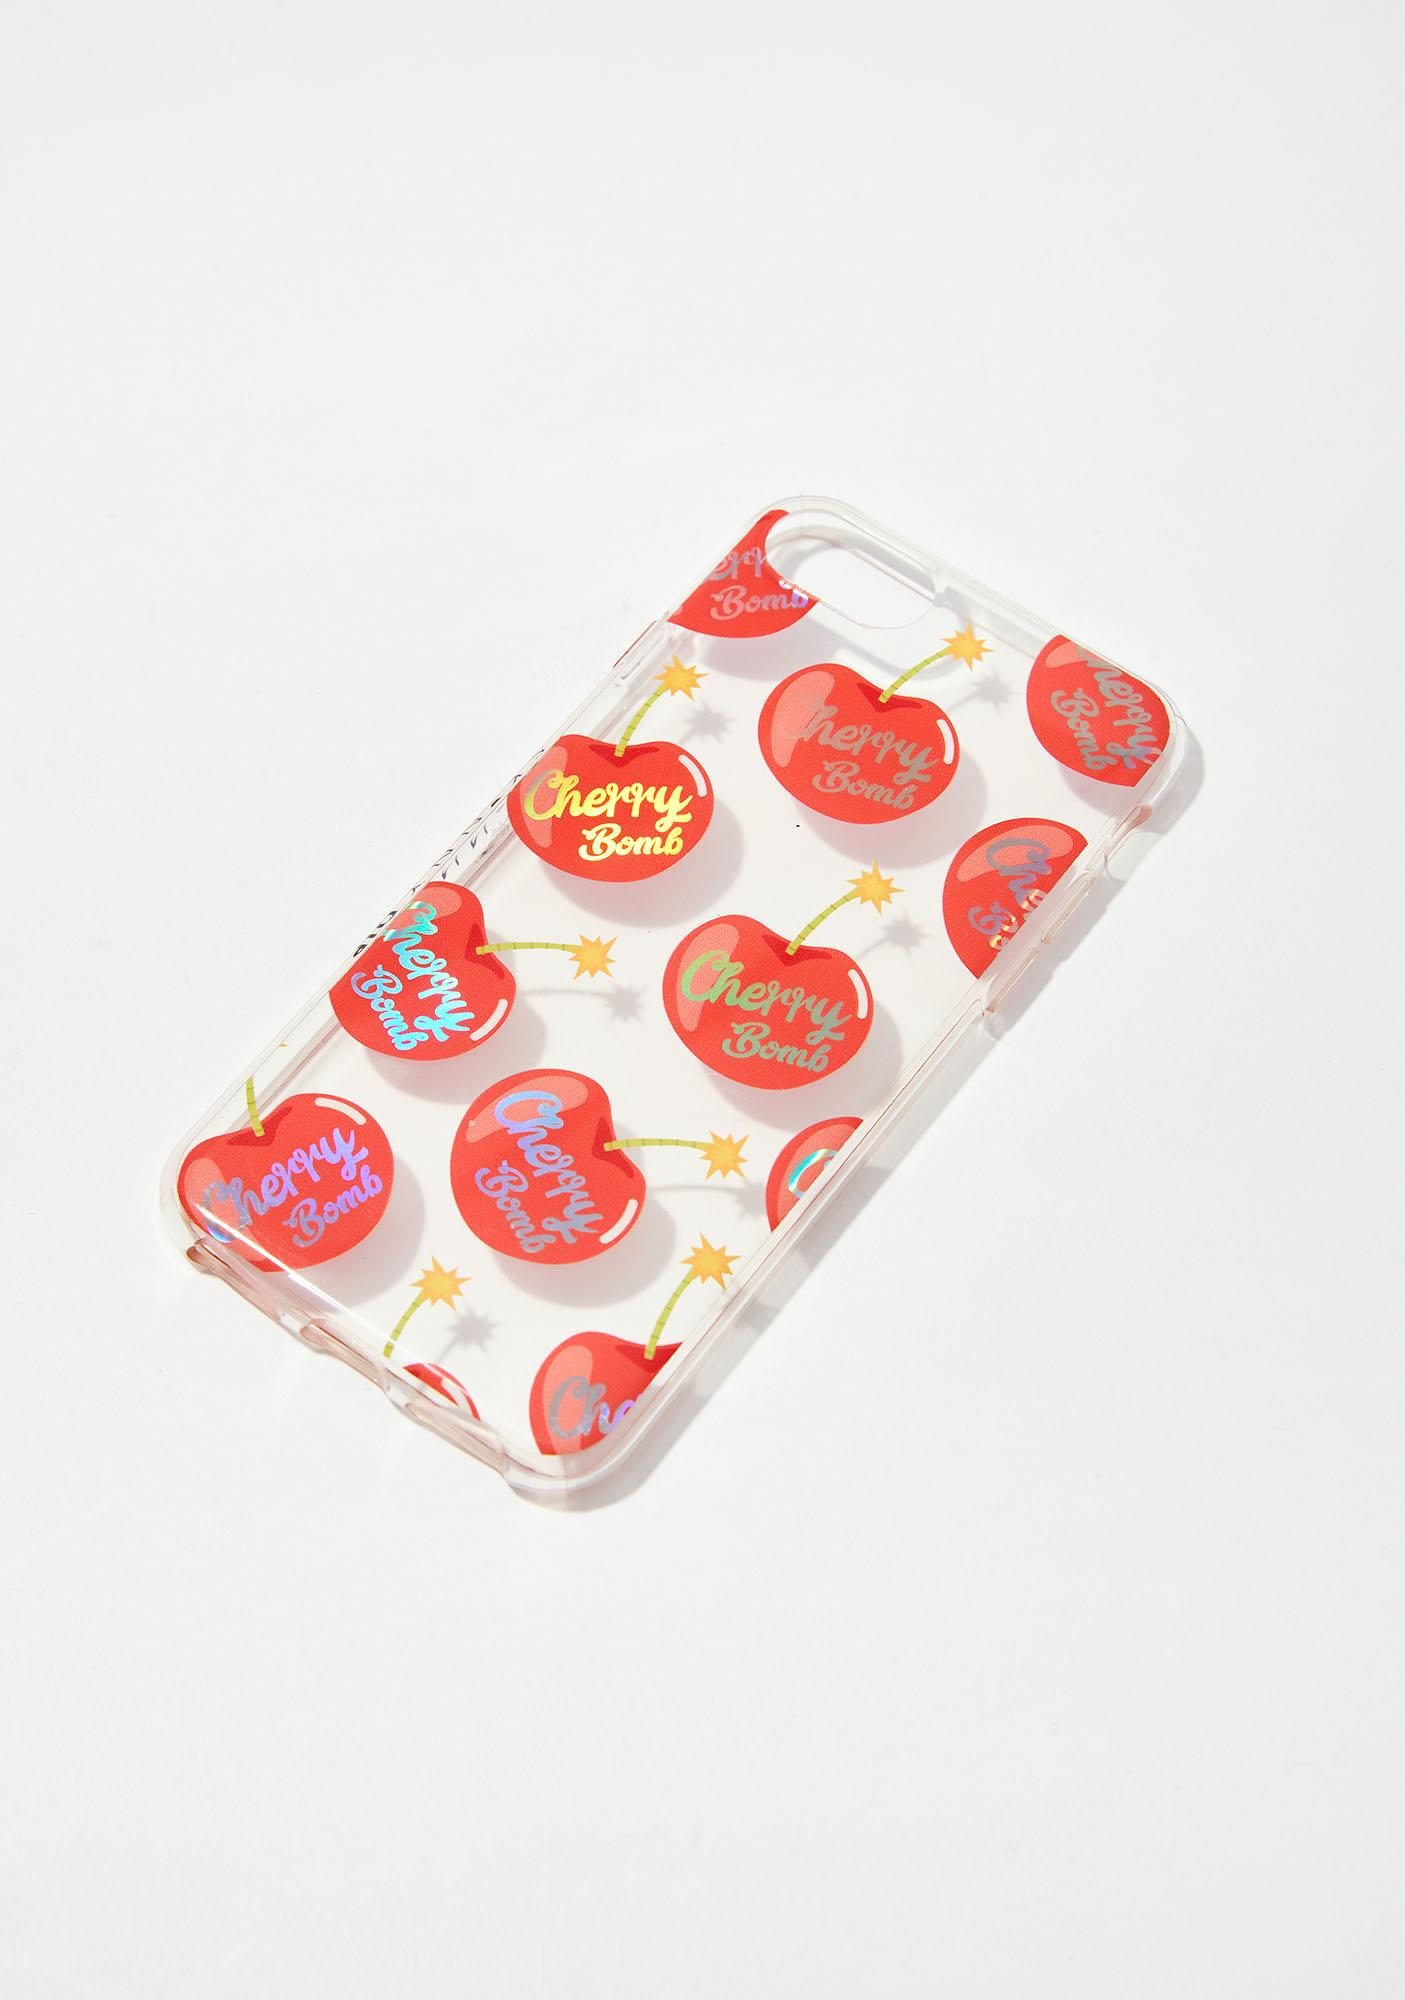 Skinnydip Cherry Bomb iPhone Case